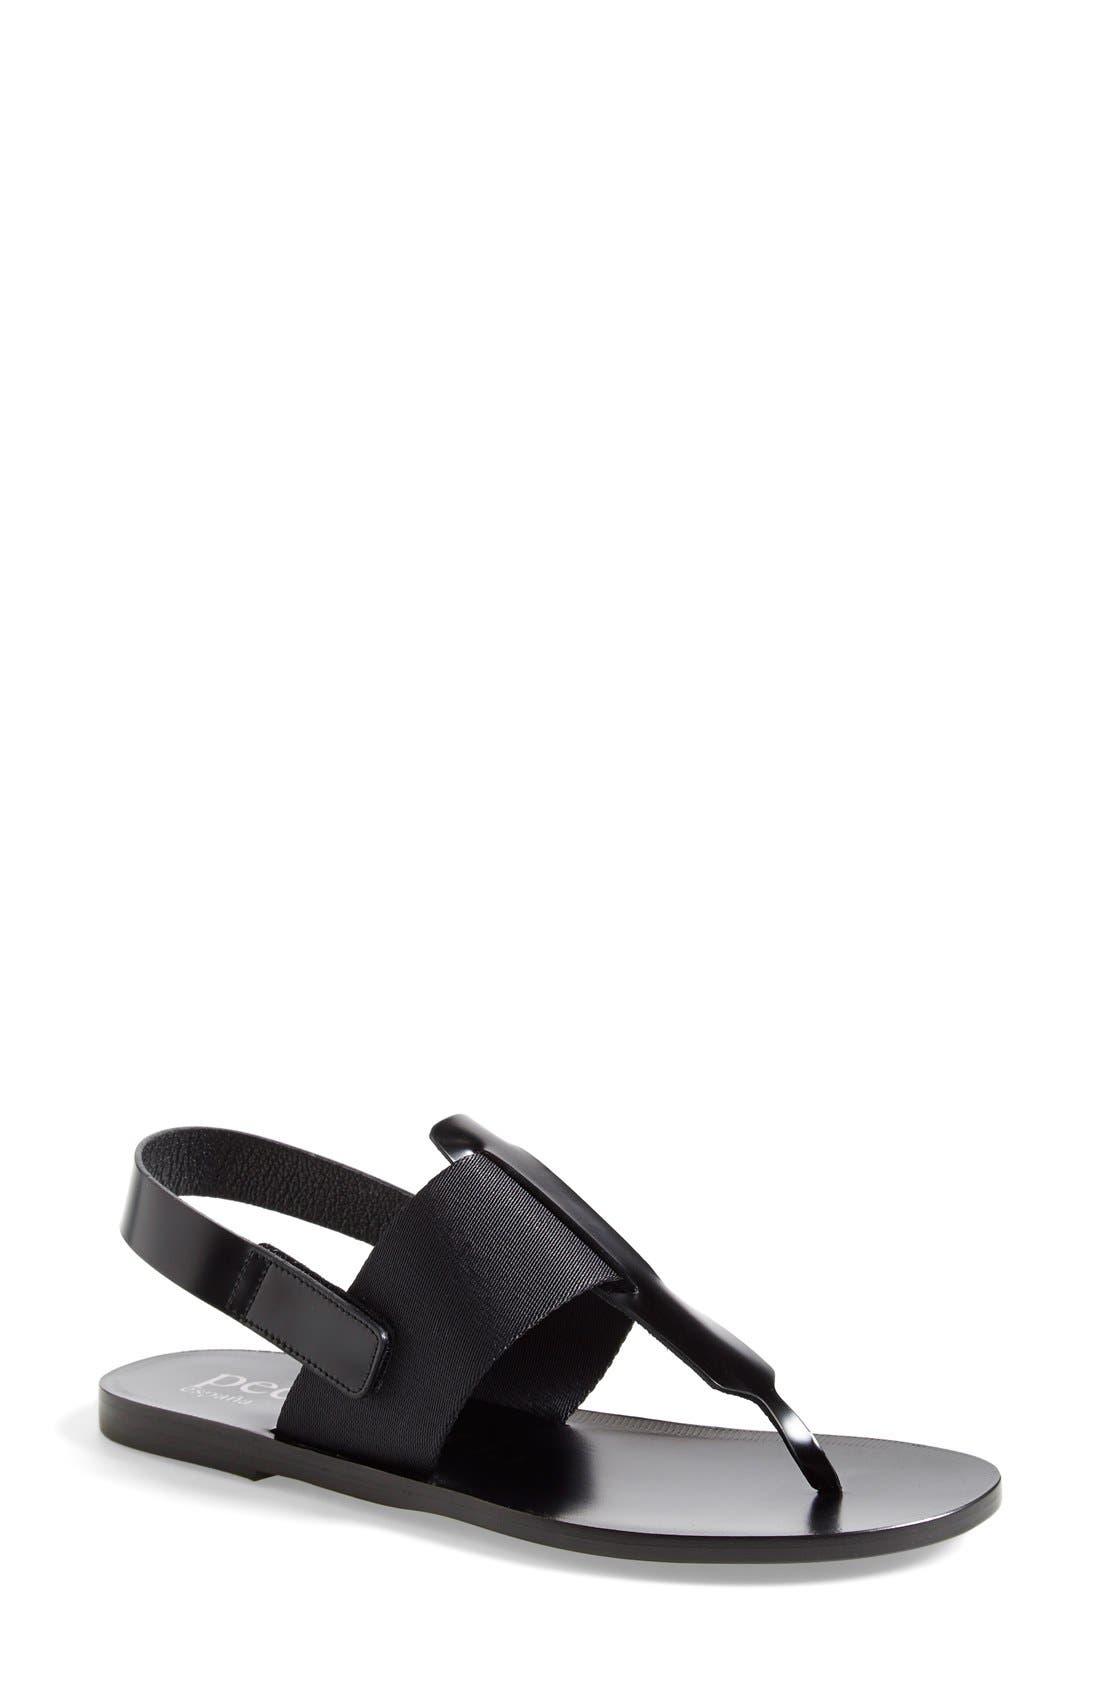 Alternate Image 1 Selected - Pedro Garcia 'Zula' Flat Slingback Sandal (Women)